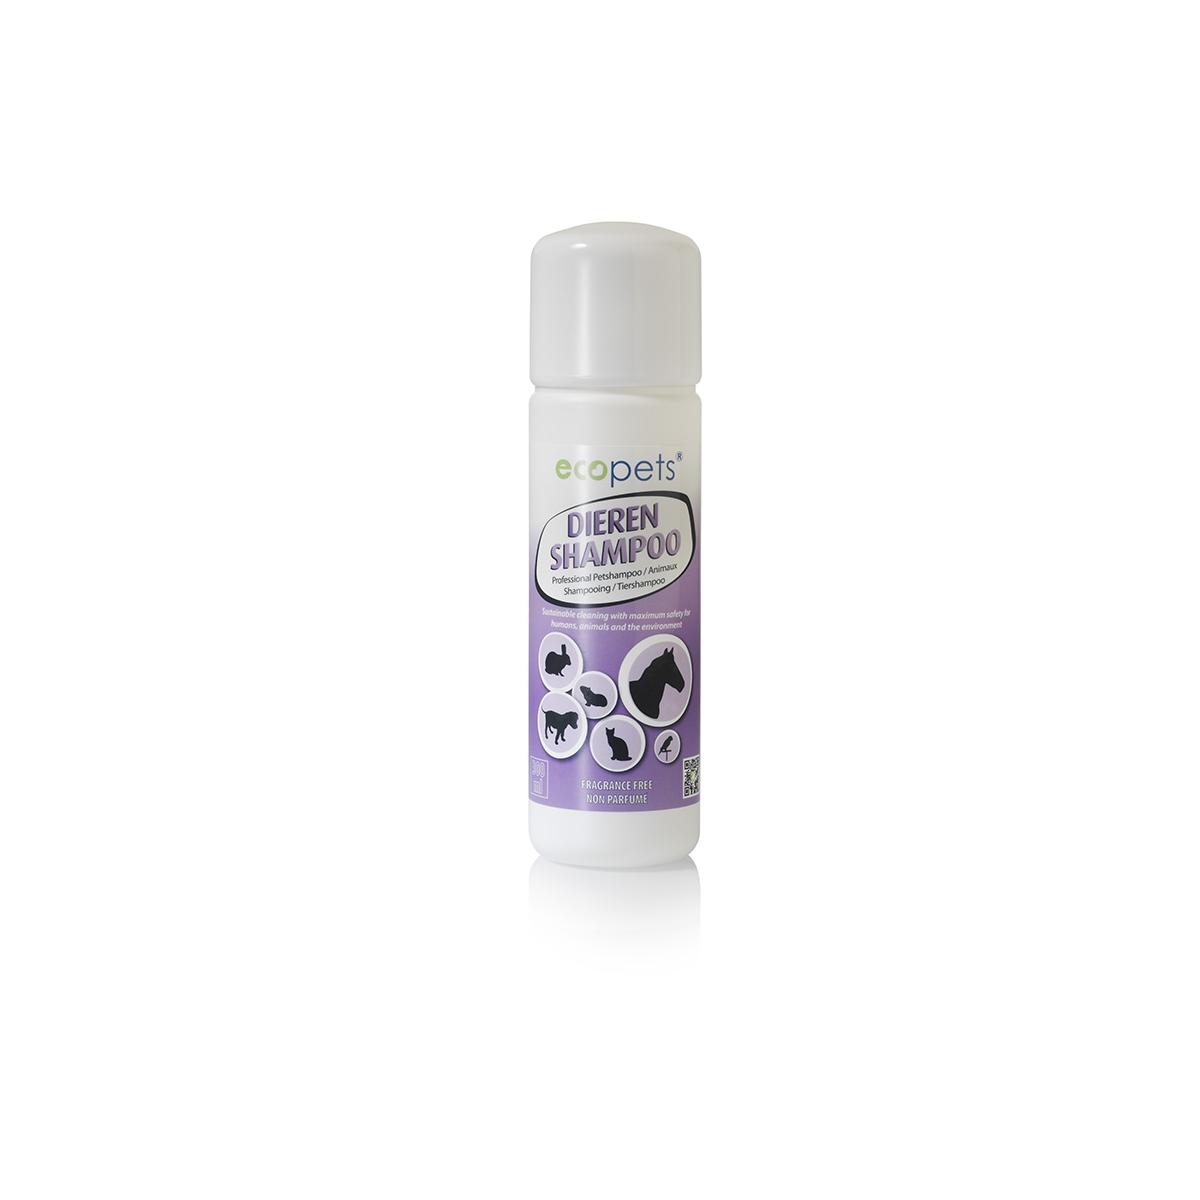 Ecopets shampoo meerkleurig 300 ml